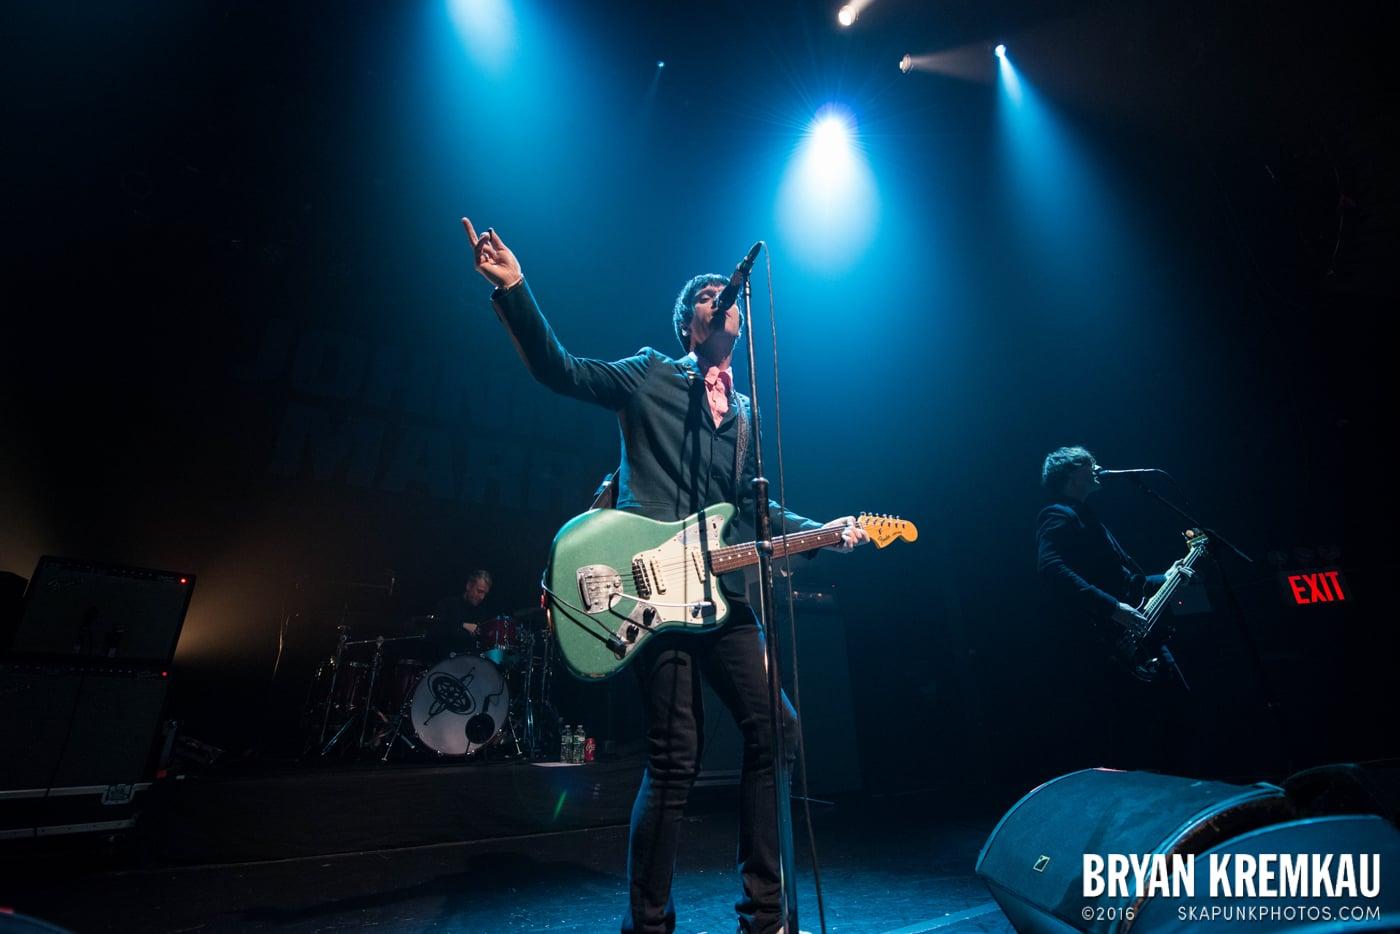 Johnny Marr @ Gramercy Theatre, NYC - 11.12.14 (5)